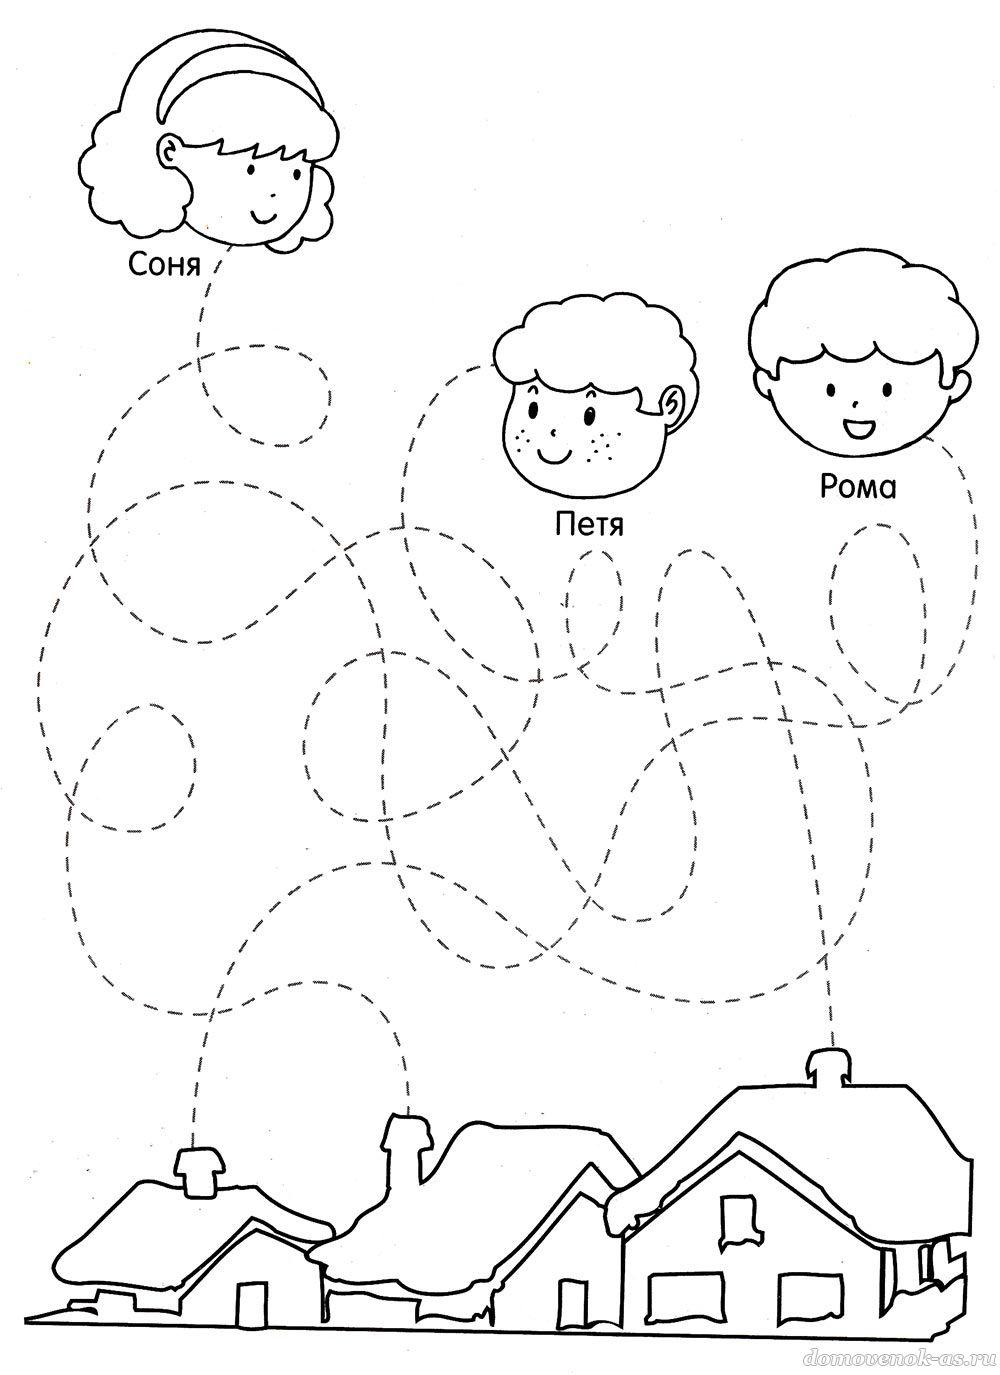 Игры для ребенка 4 года раскраски